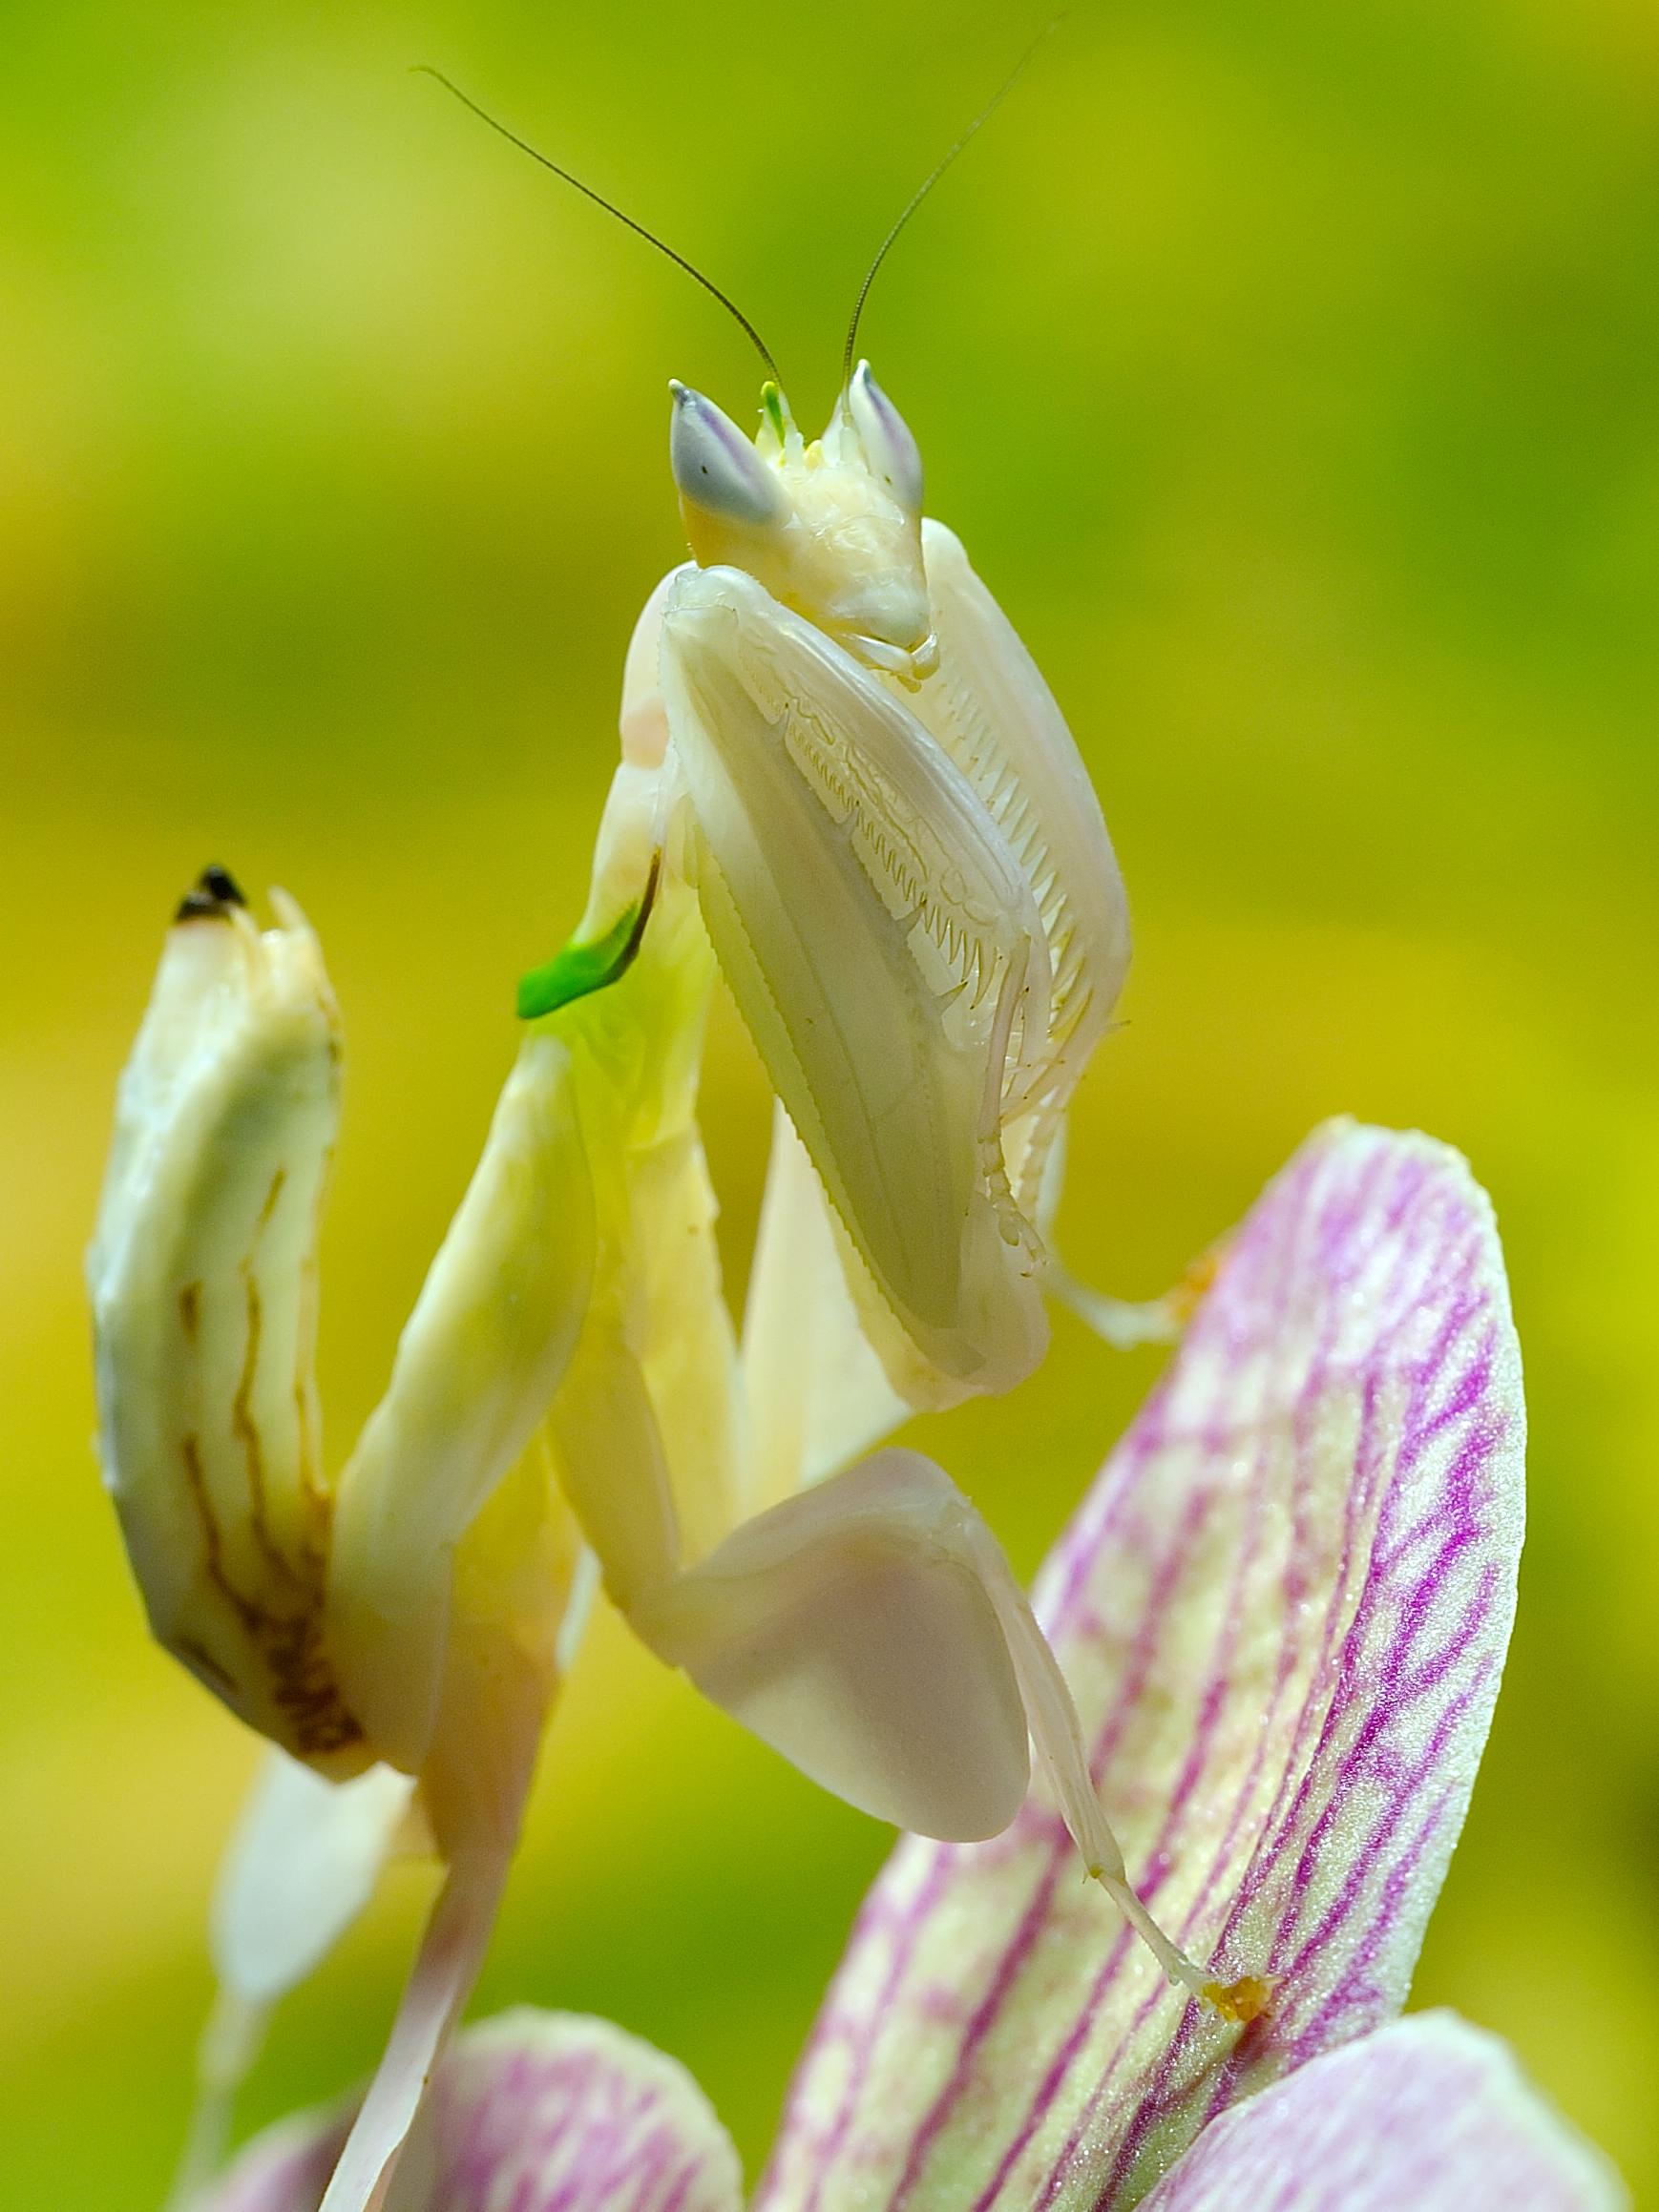 Flower mantis - Wikipedia